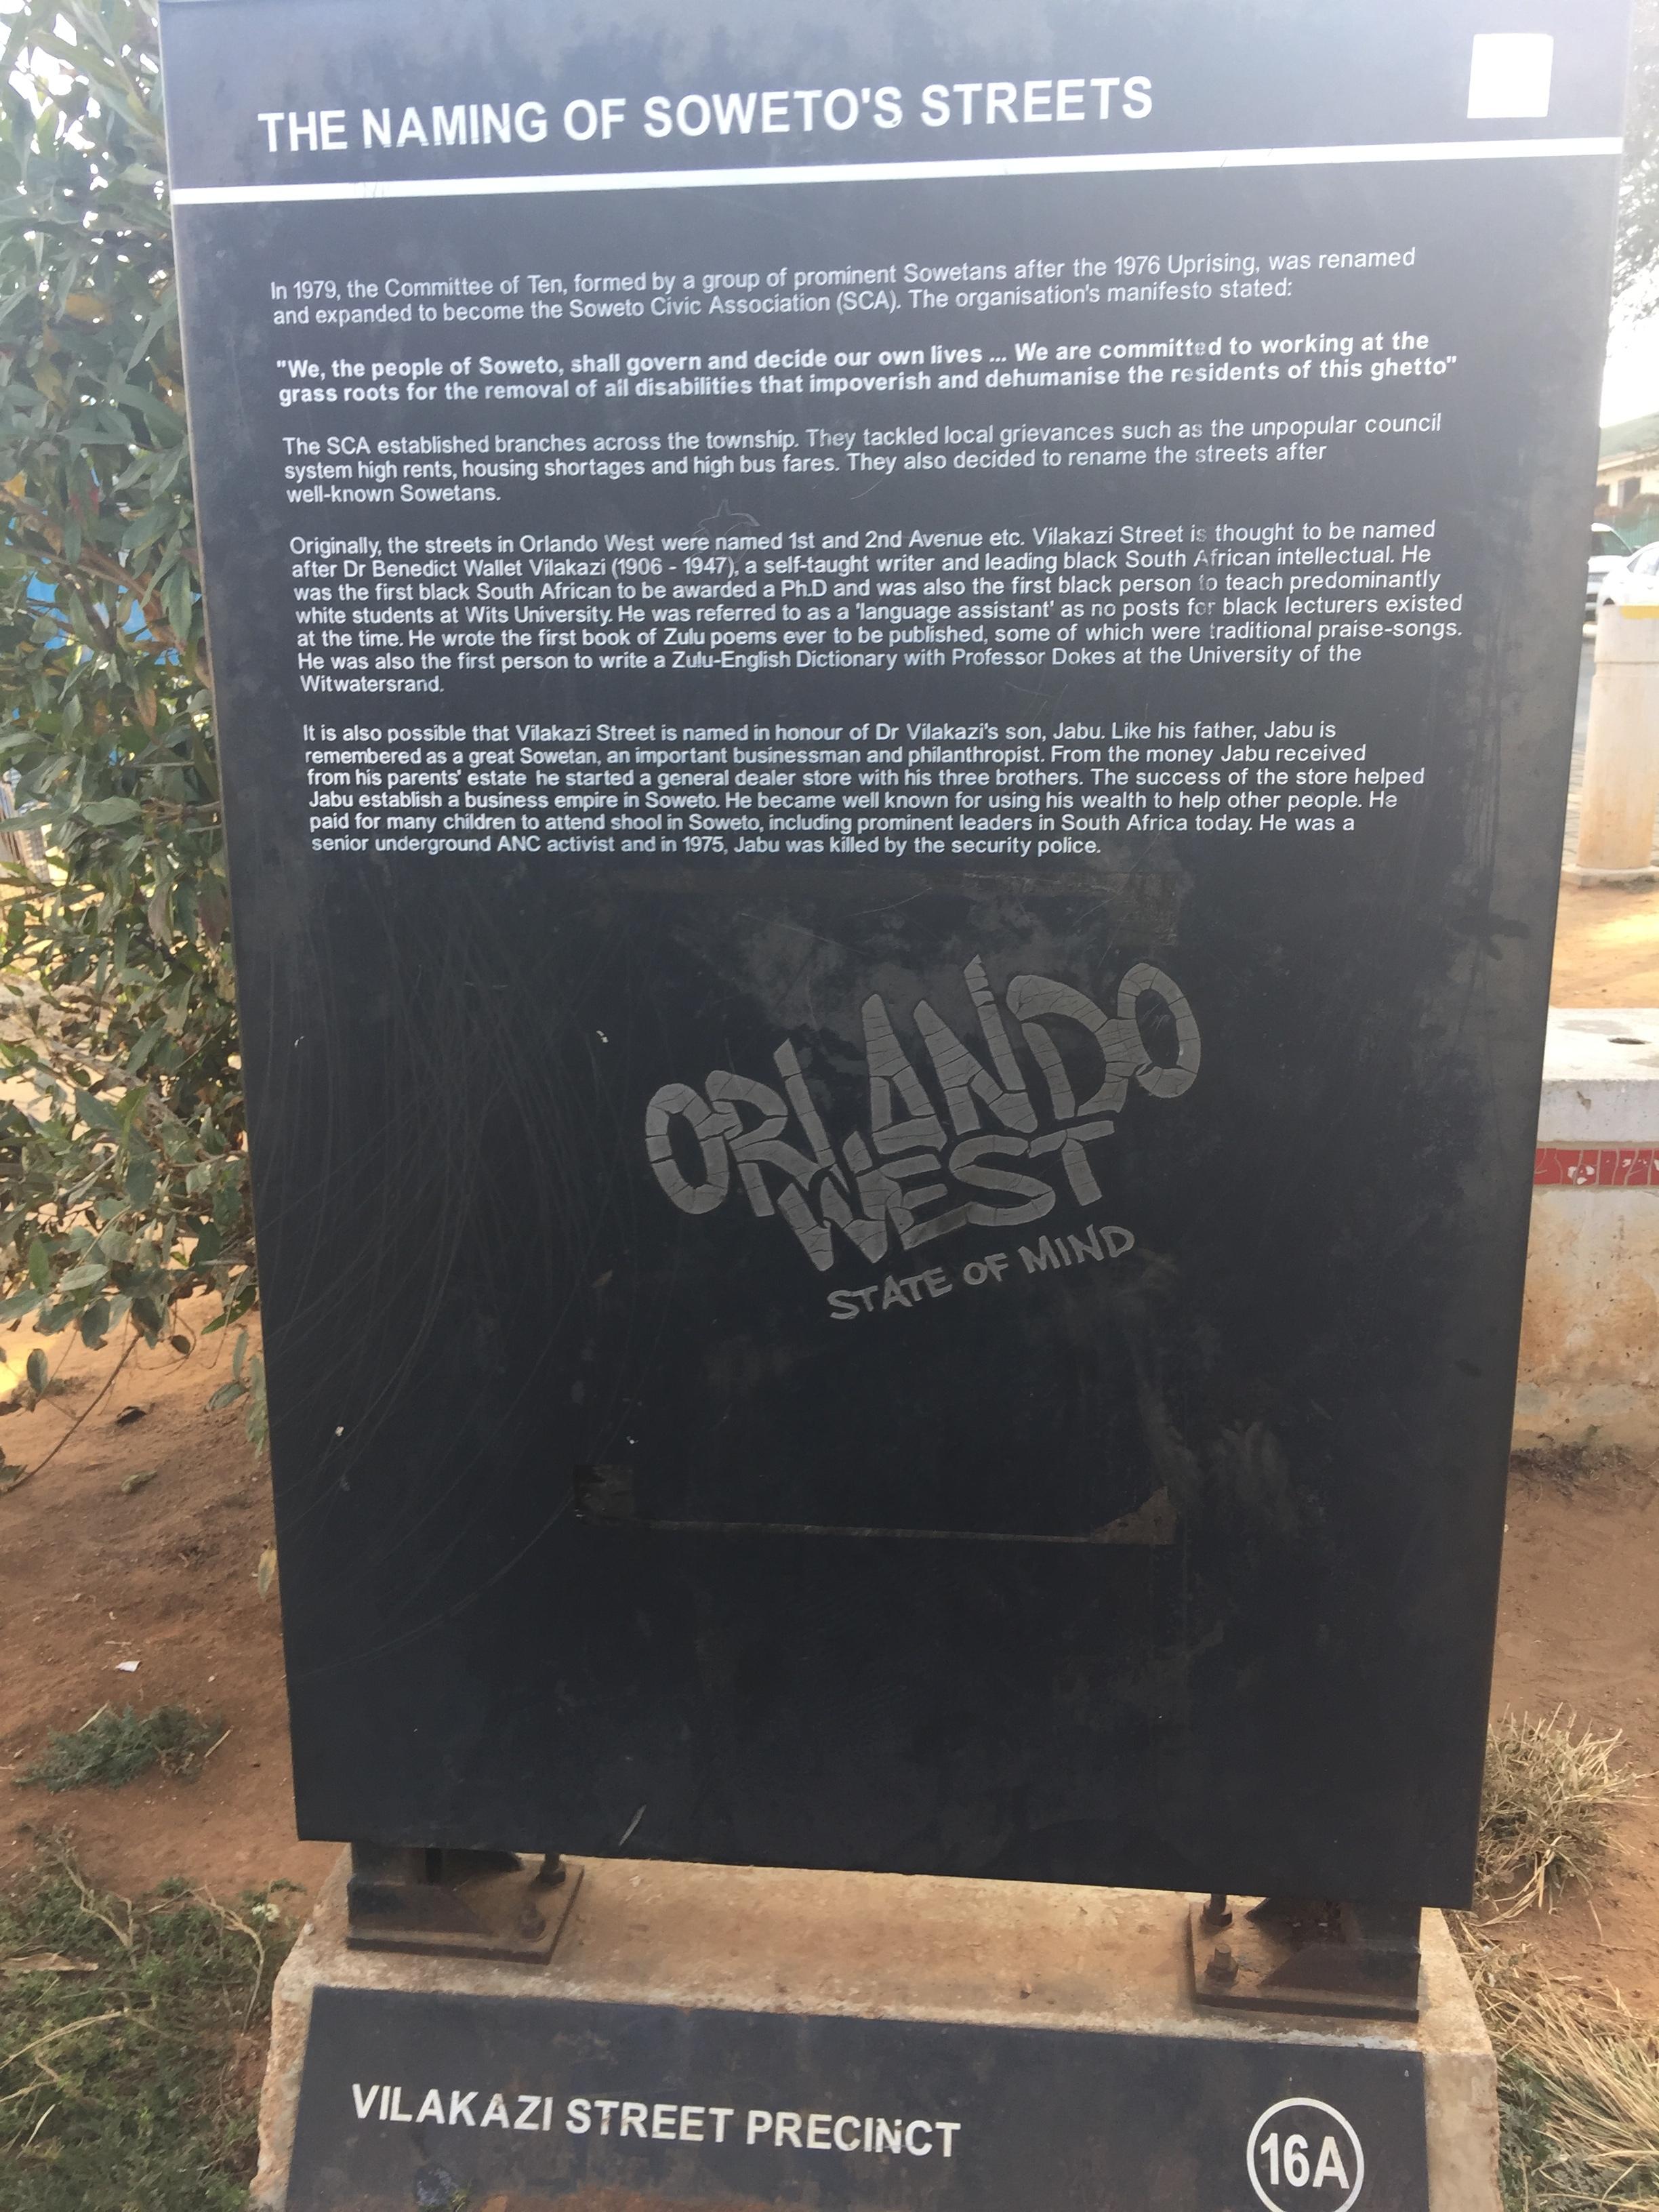 Sign at Vilakazi Street in Soweto